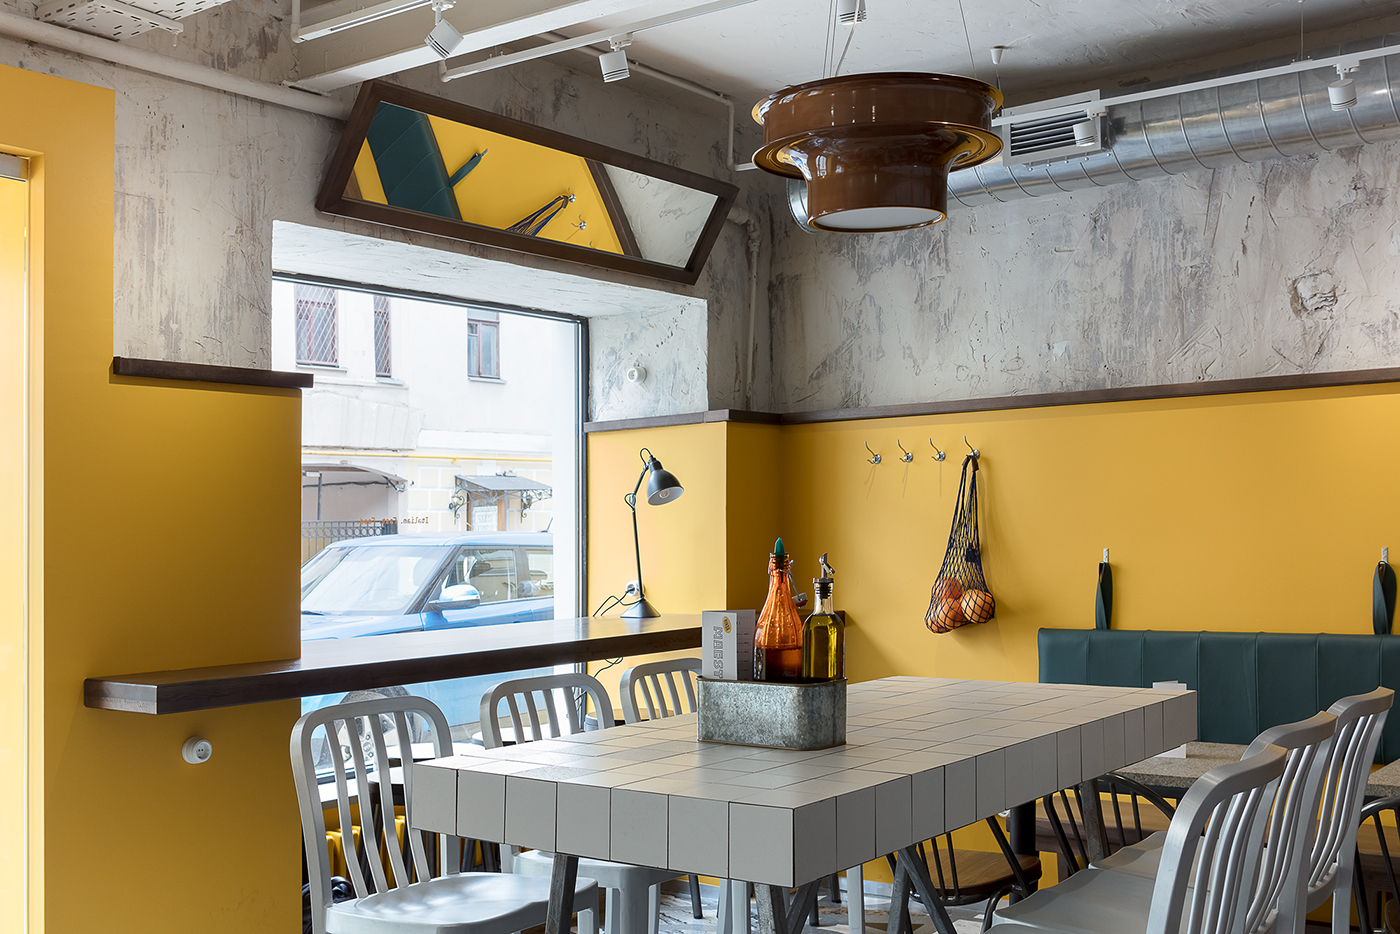 restaurant Pizza cafe bistro menu Food  bar branding  PINSA streetfood